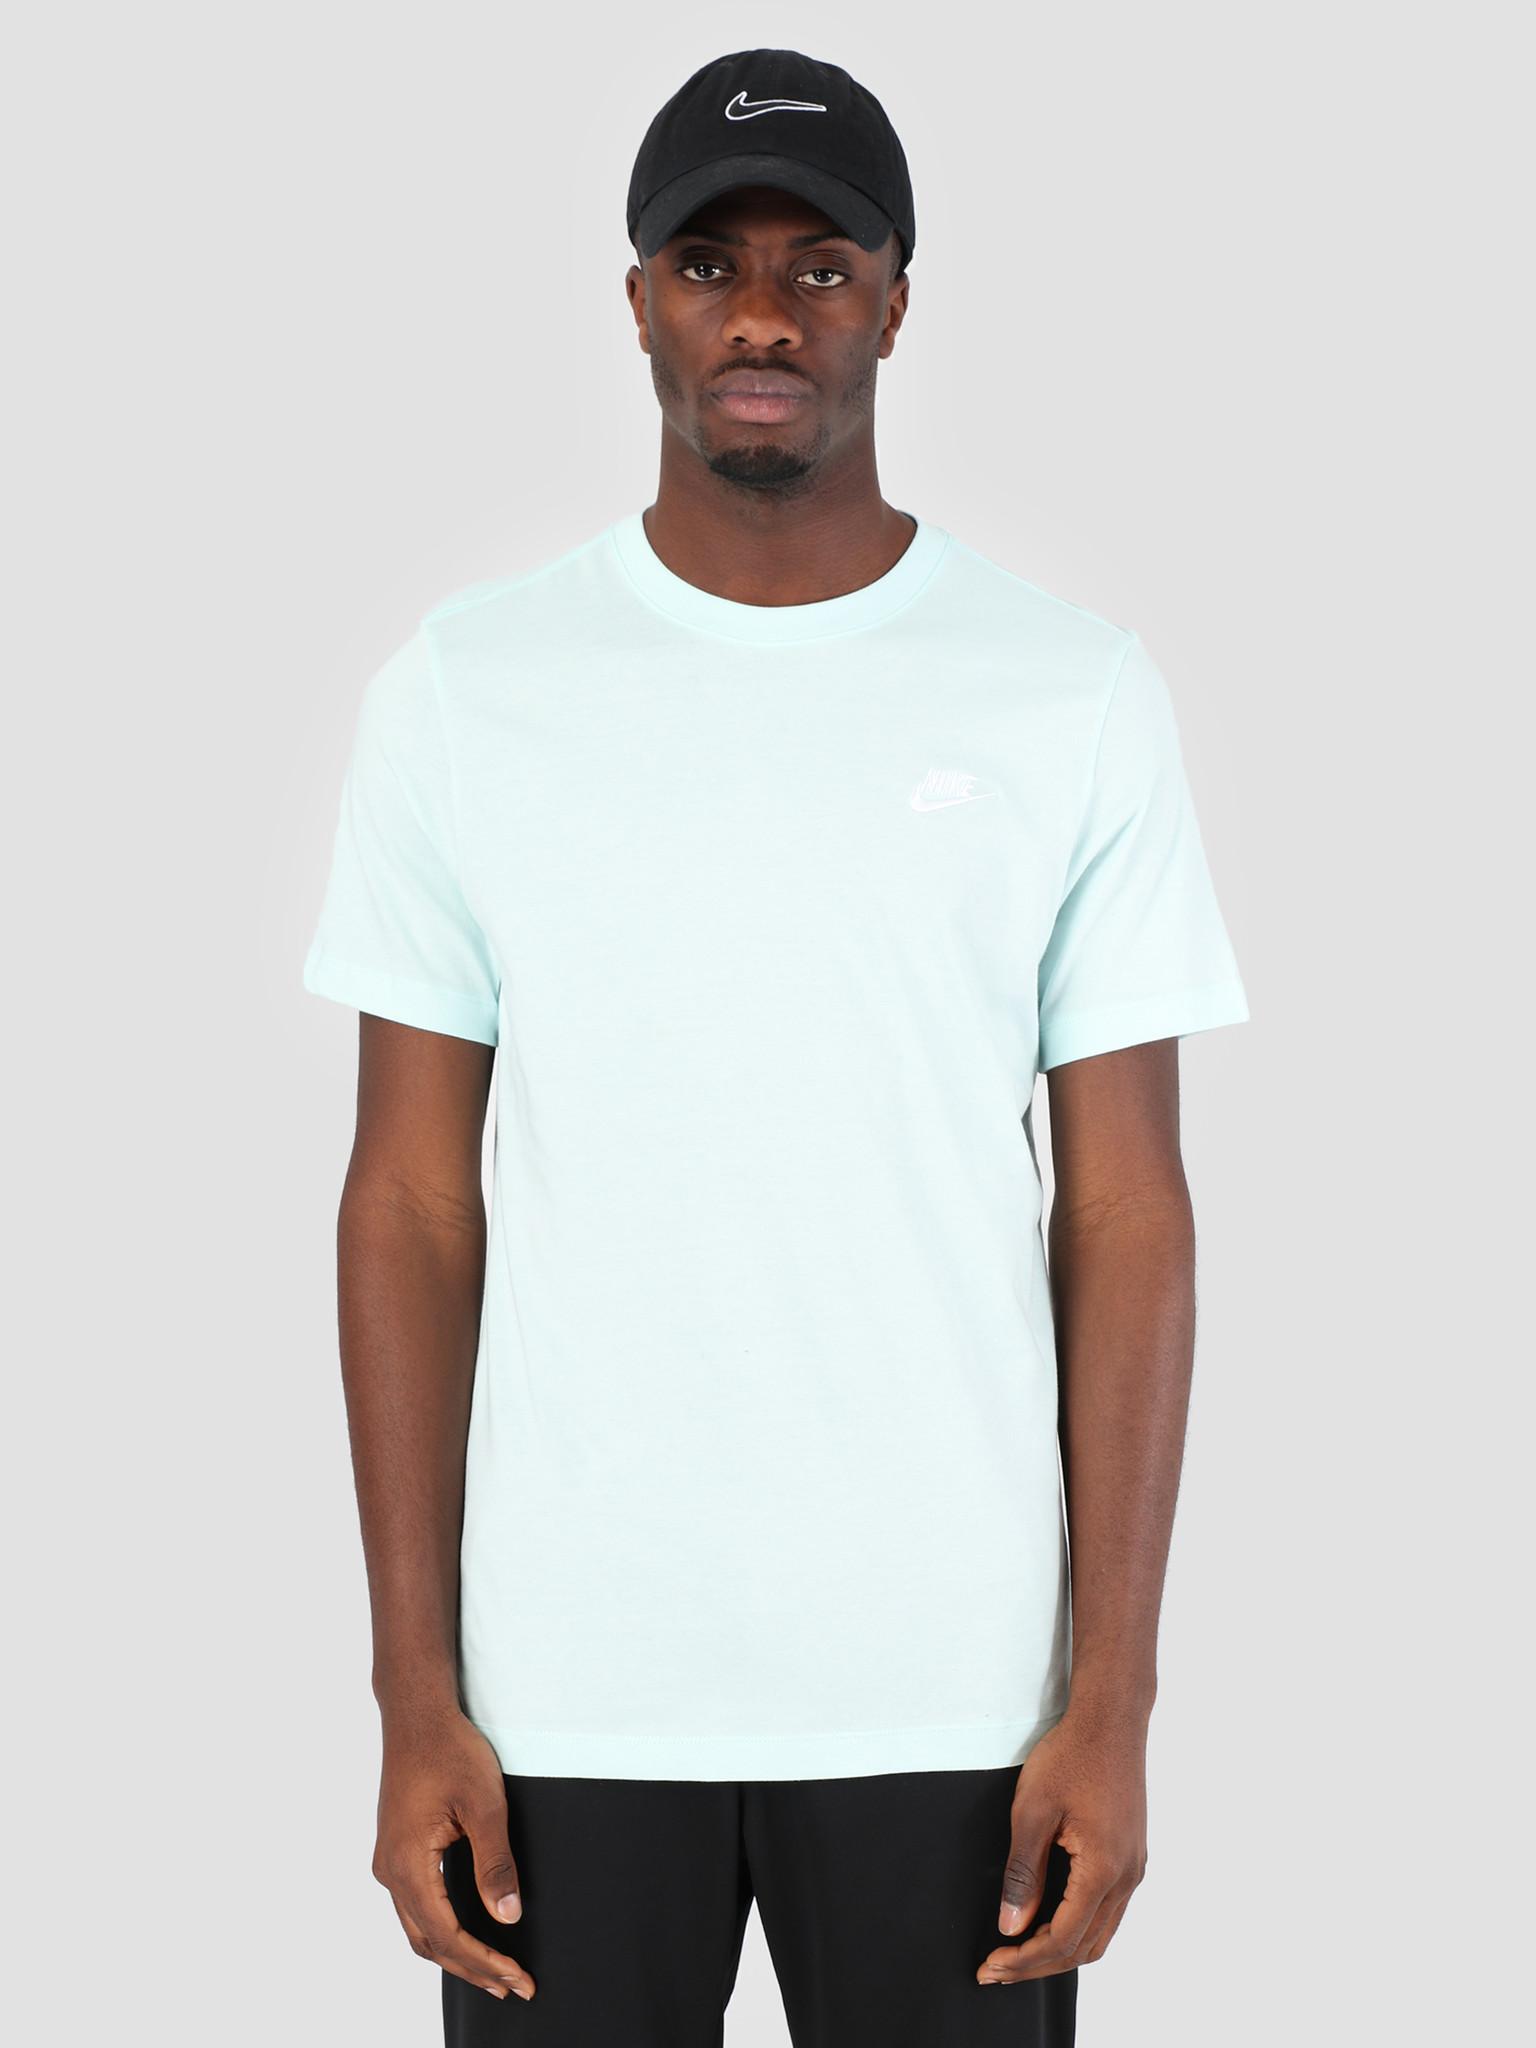 84d69351a0 Nike Sportswear T-Shirt Teal Tint White AR4997-336   FRESHCOTTON